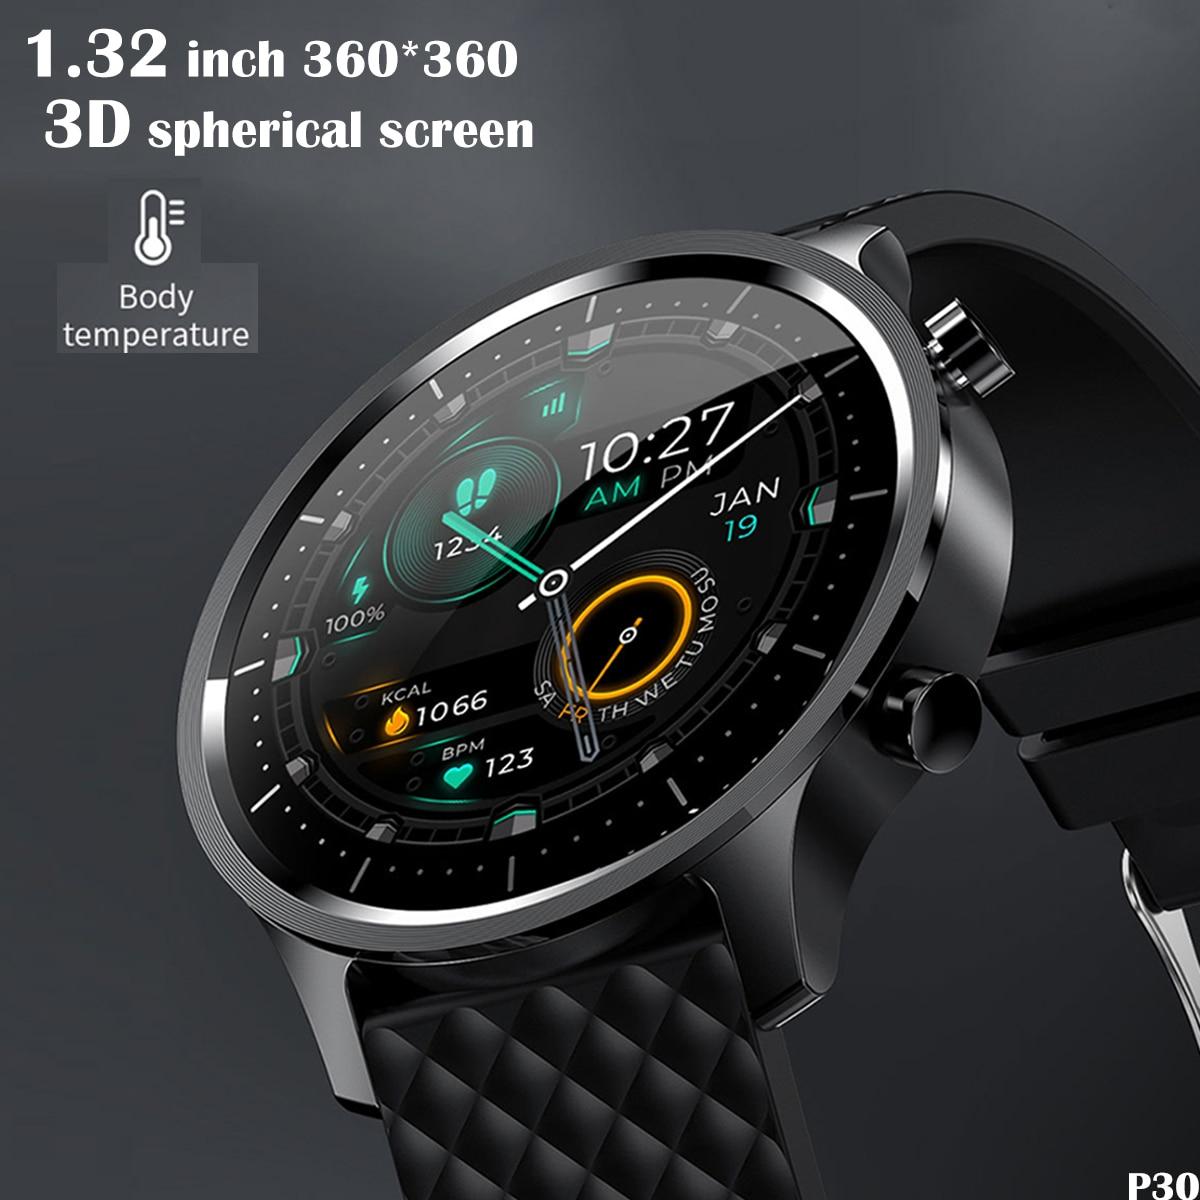 P30 2021 NEW Smart Watch Men 3D Spherical Full Touch Screen Fitness...